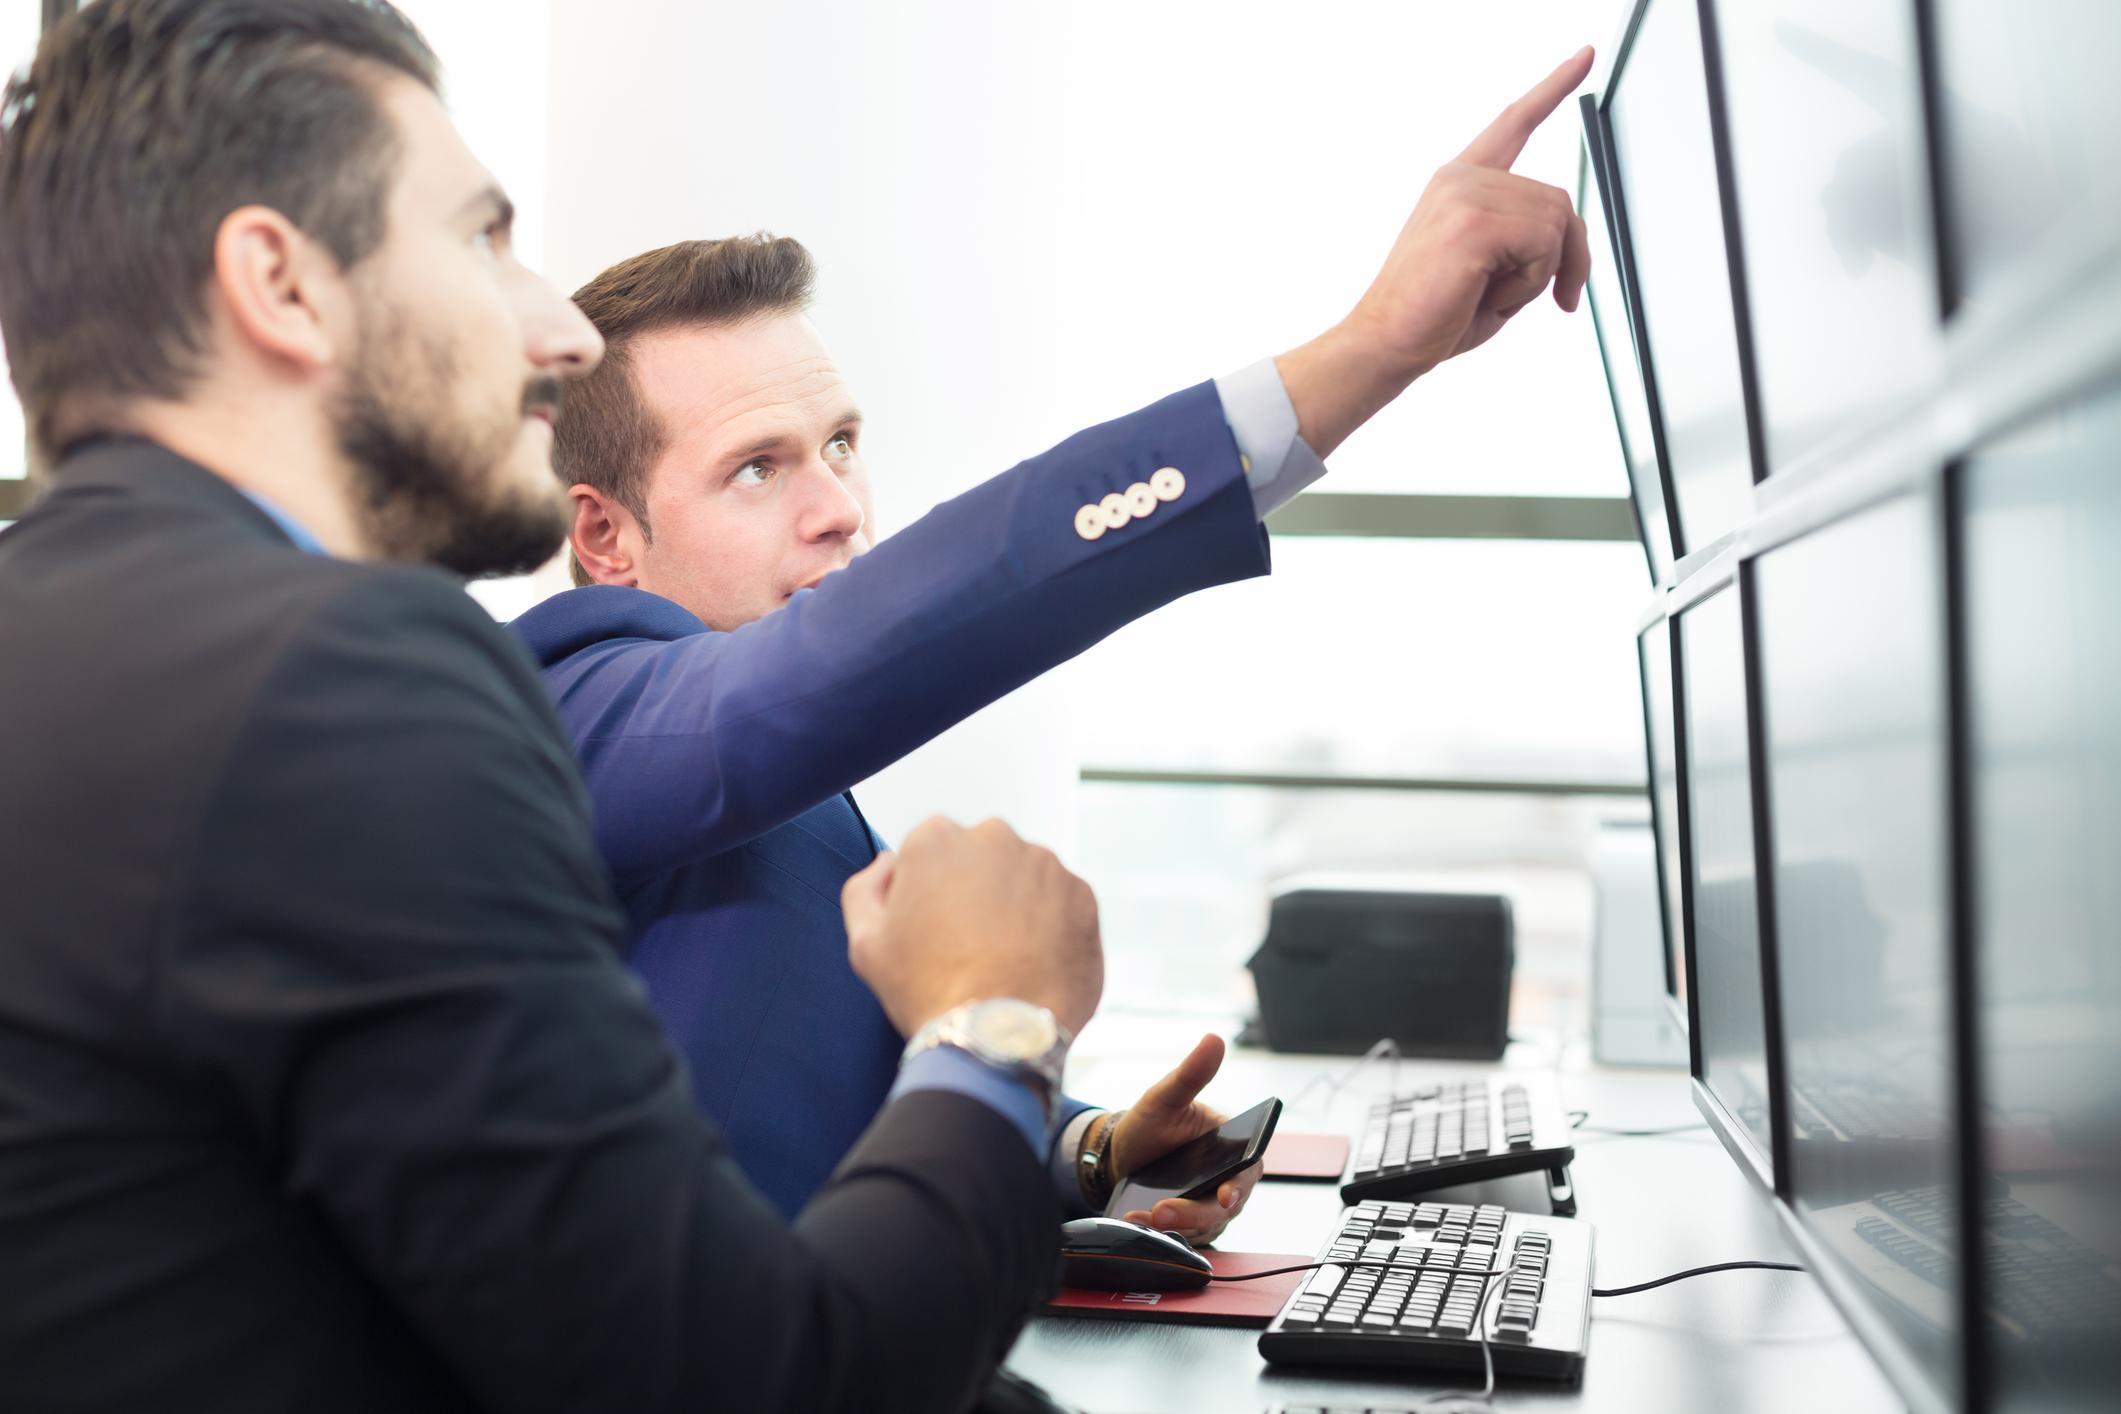 Stock traders looking at charts on computer screens.